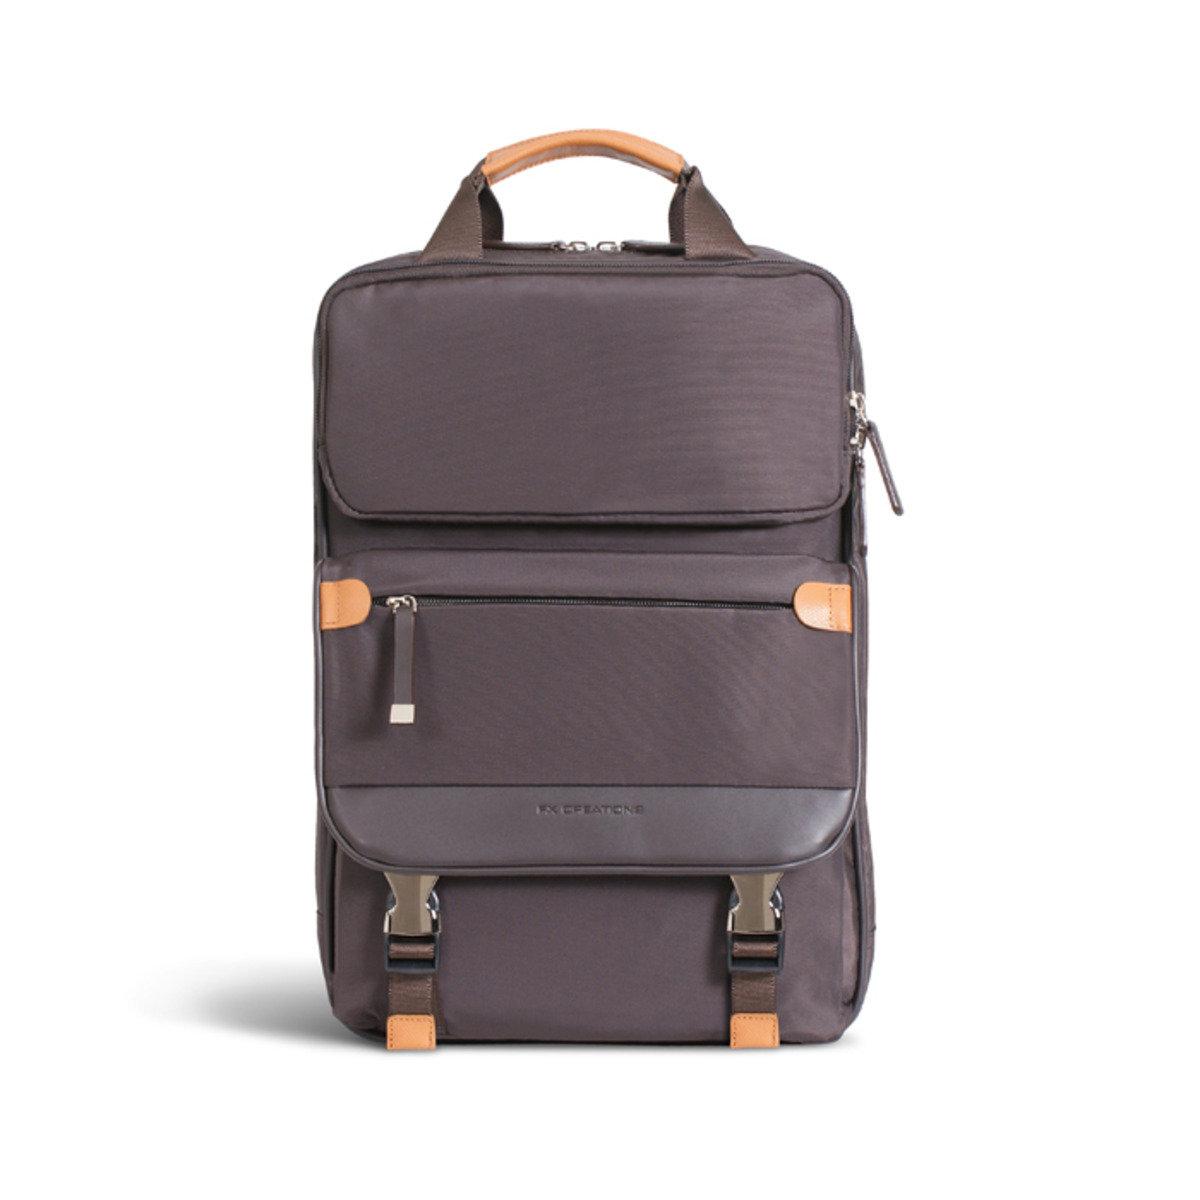 DUO Advance背包